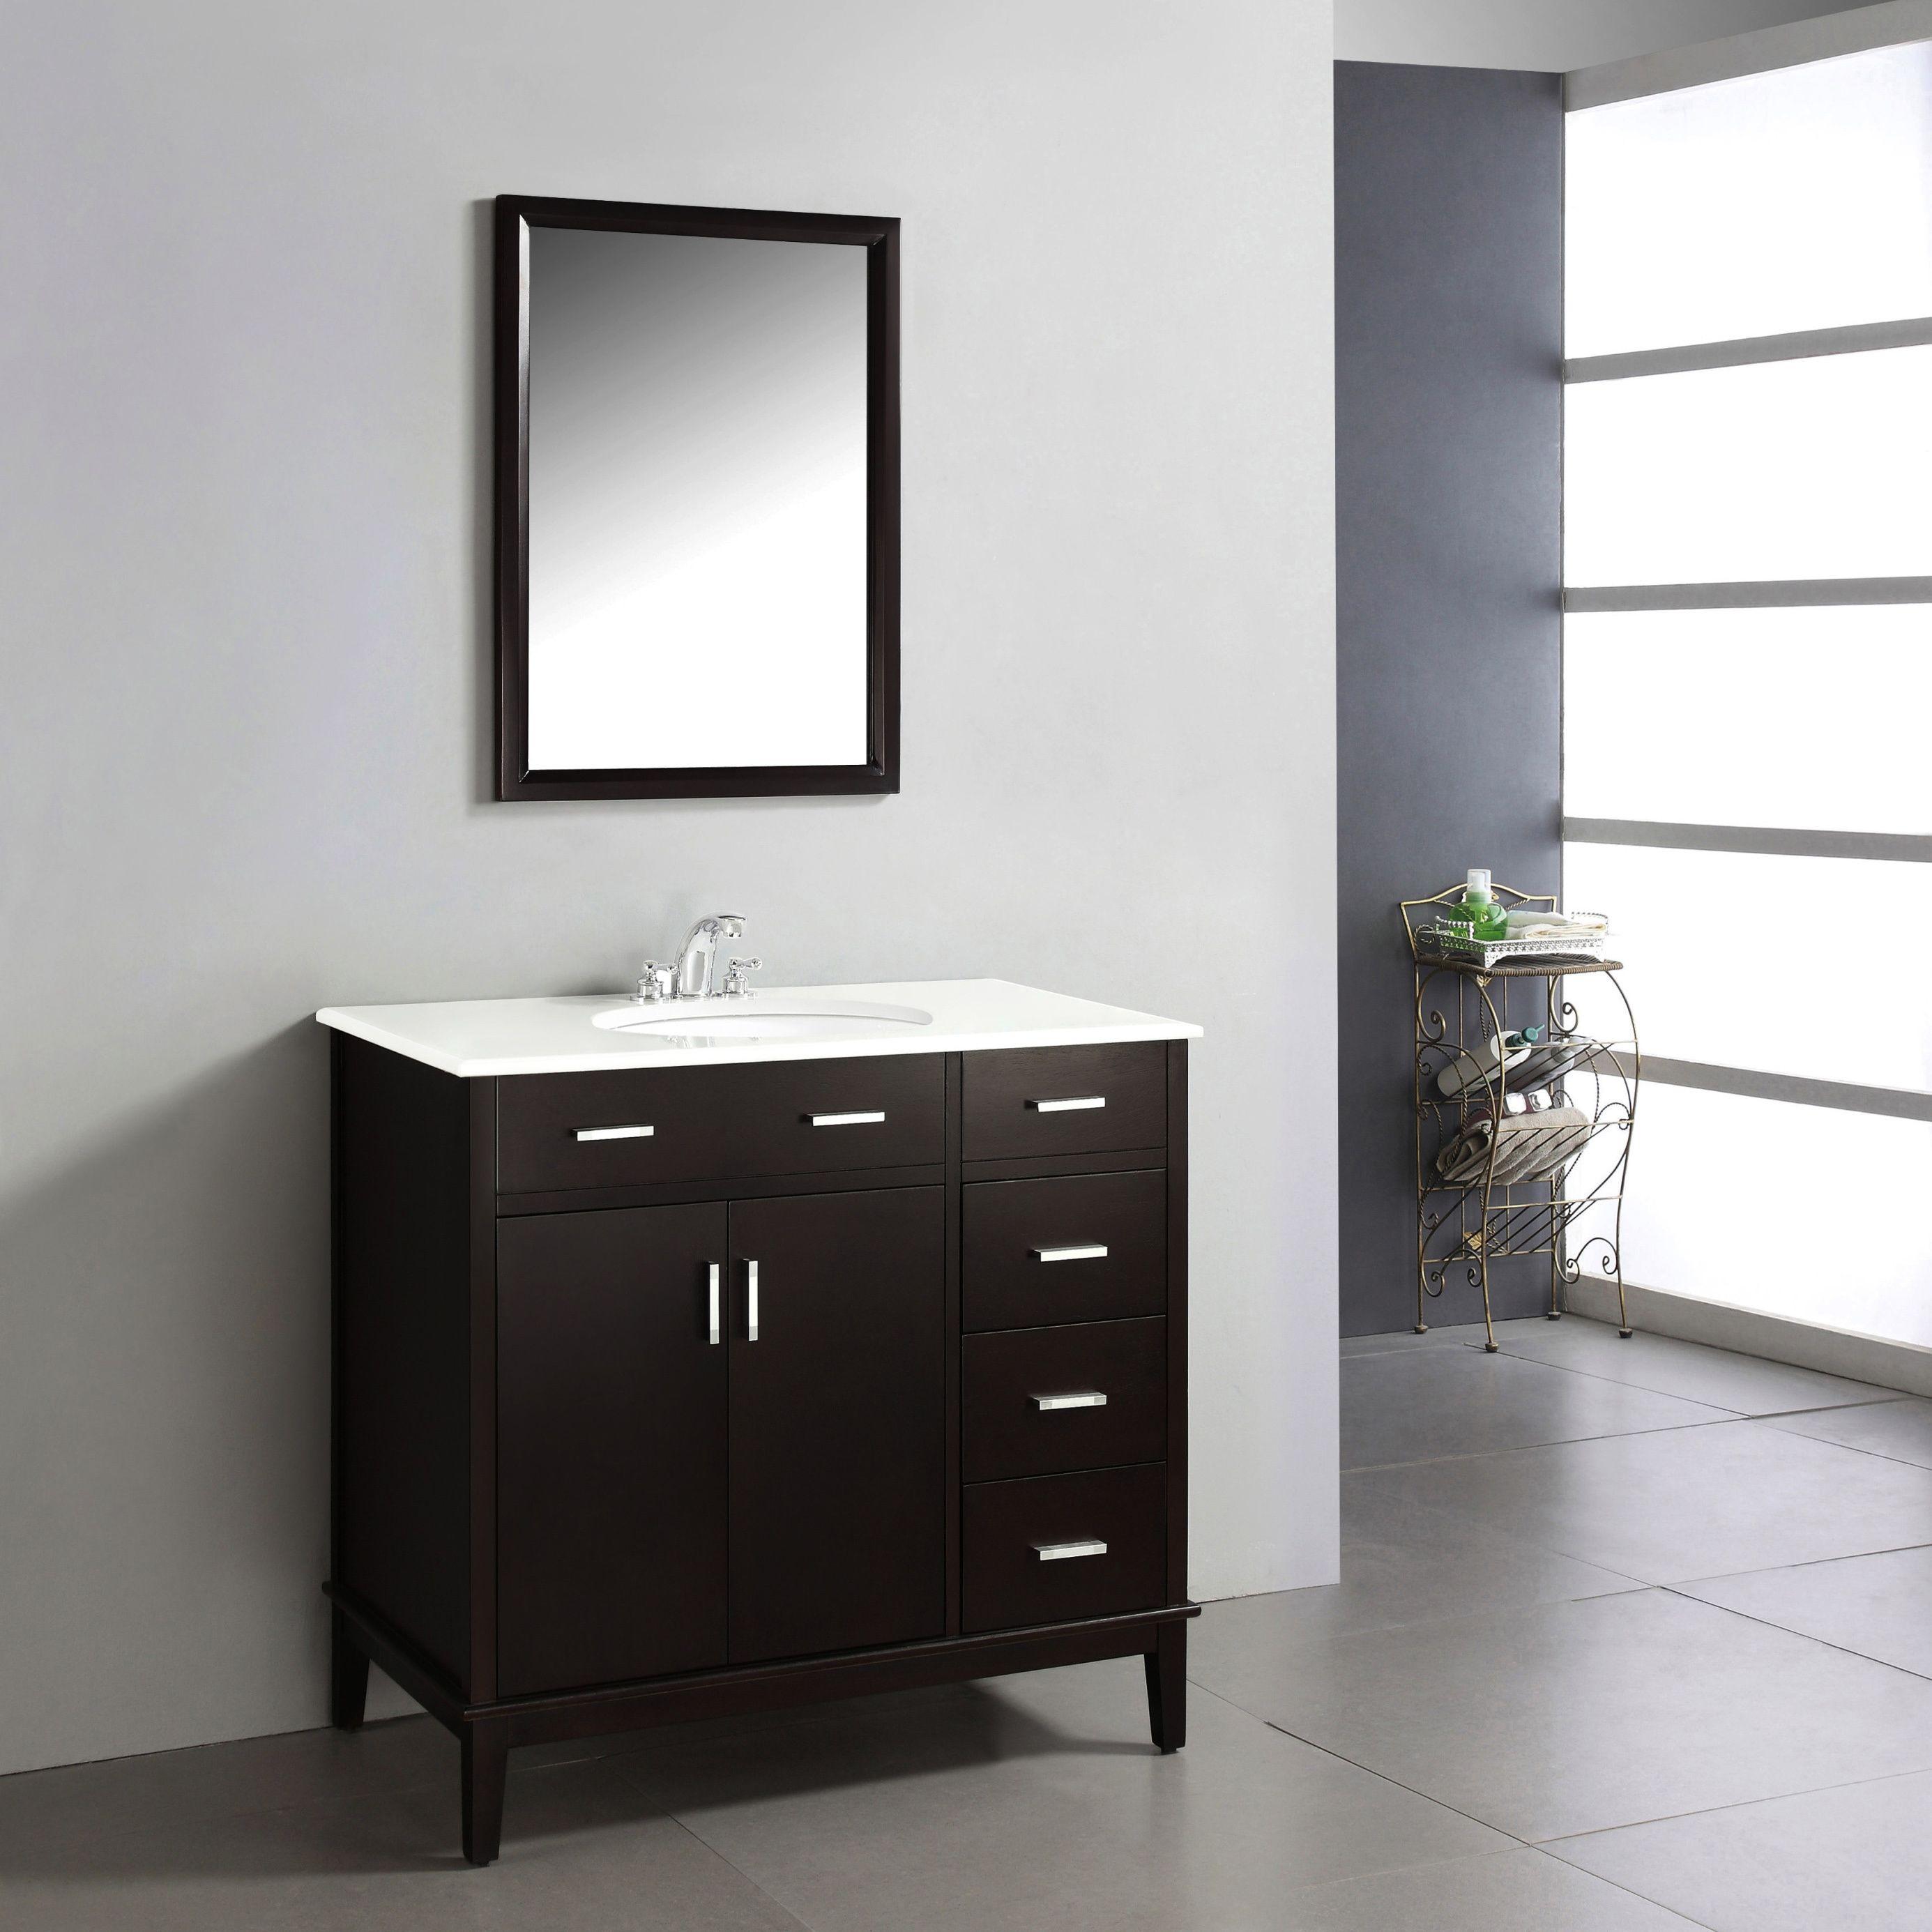 Wyndenhall Oxford 36 Inch Contemporary Bath Vanity In Dark Espresso Brown With White Engineered Quartz Marble Top Marble Vanity Tops Single Bathroom Vanity Bath Vanities